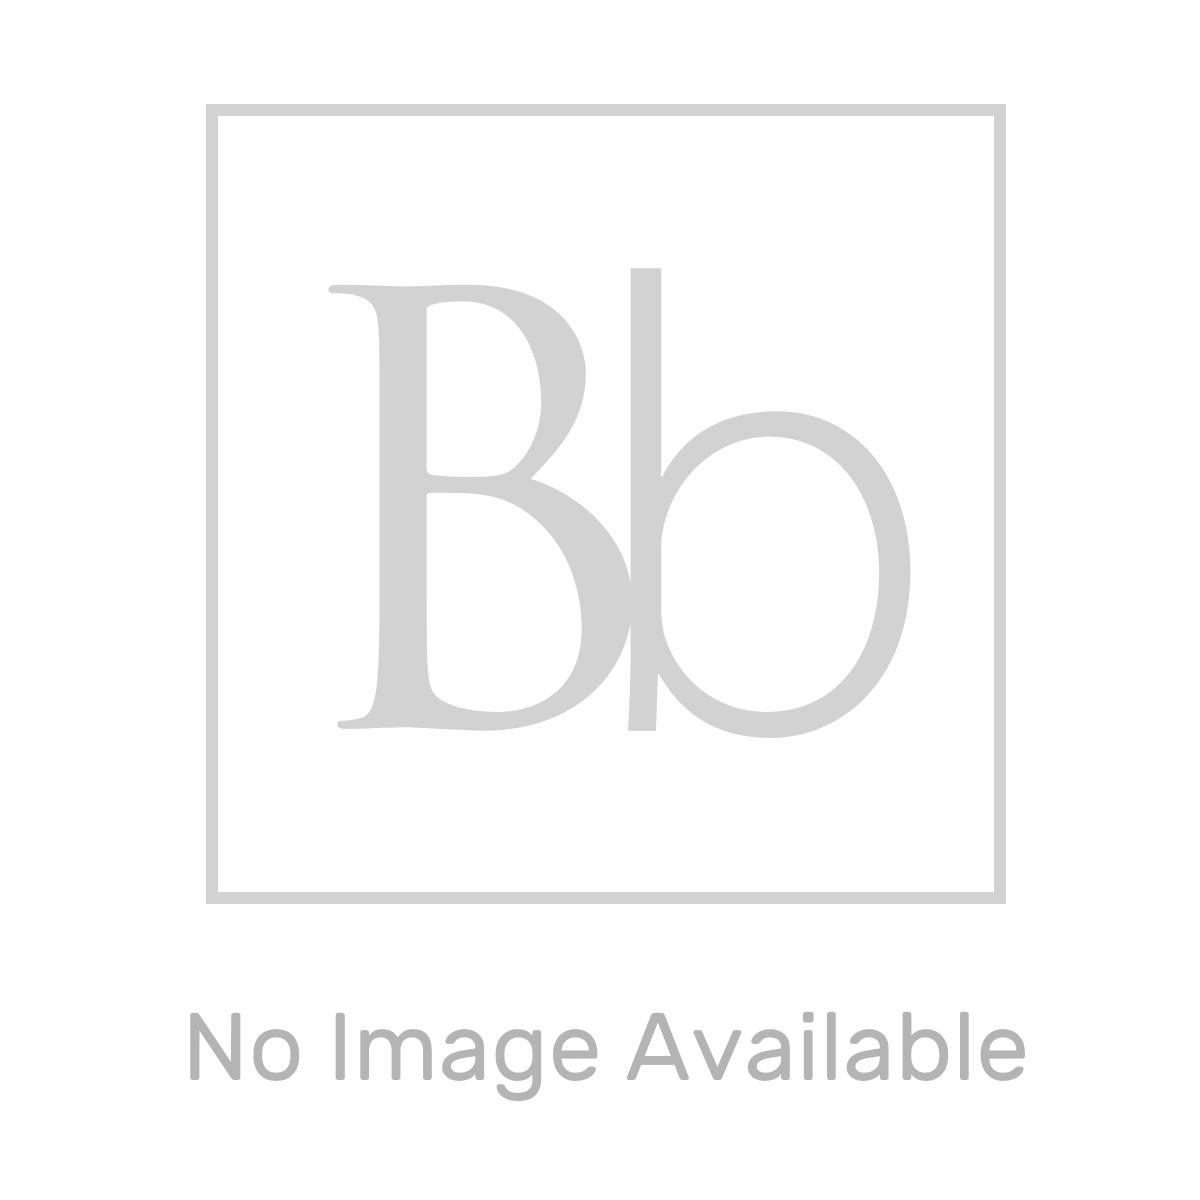 Frontline Aquaglass+ Sphere Black Tinted Offset Quadrant Shower Enclosure Dimensions